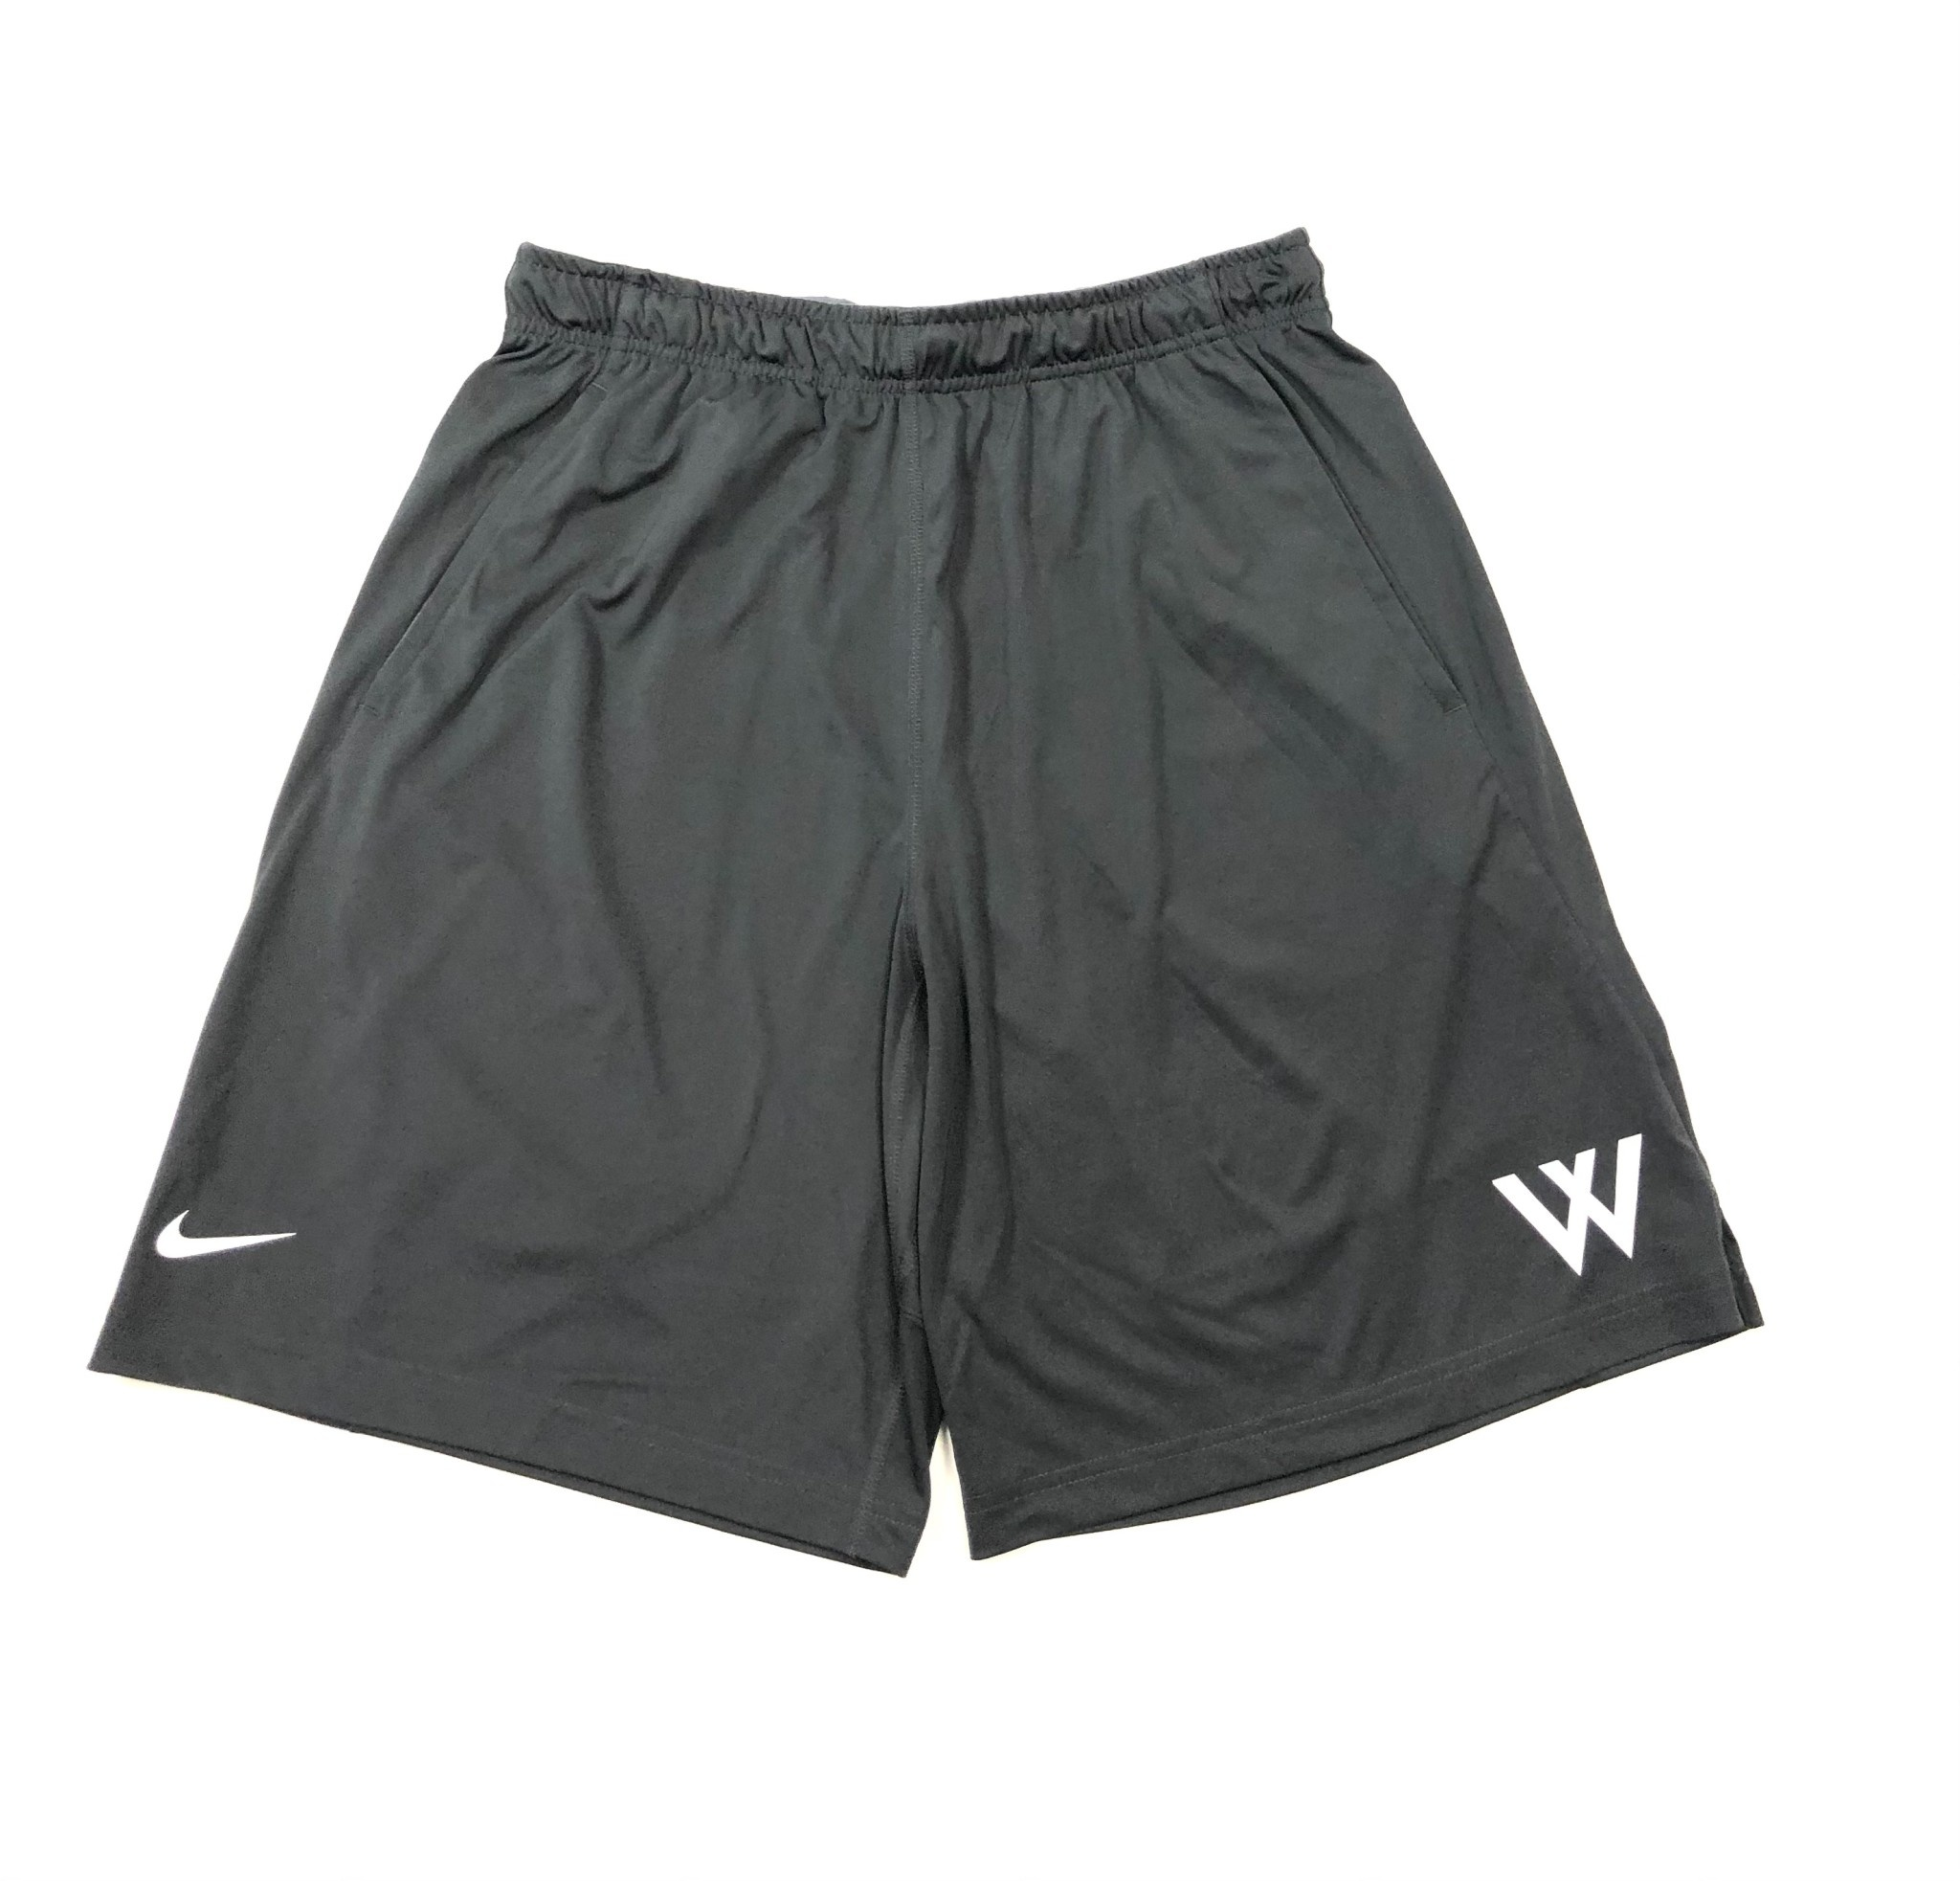 Nike Shorts: Nike Anthracite Fly 2.0 w/White W